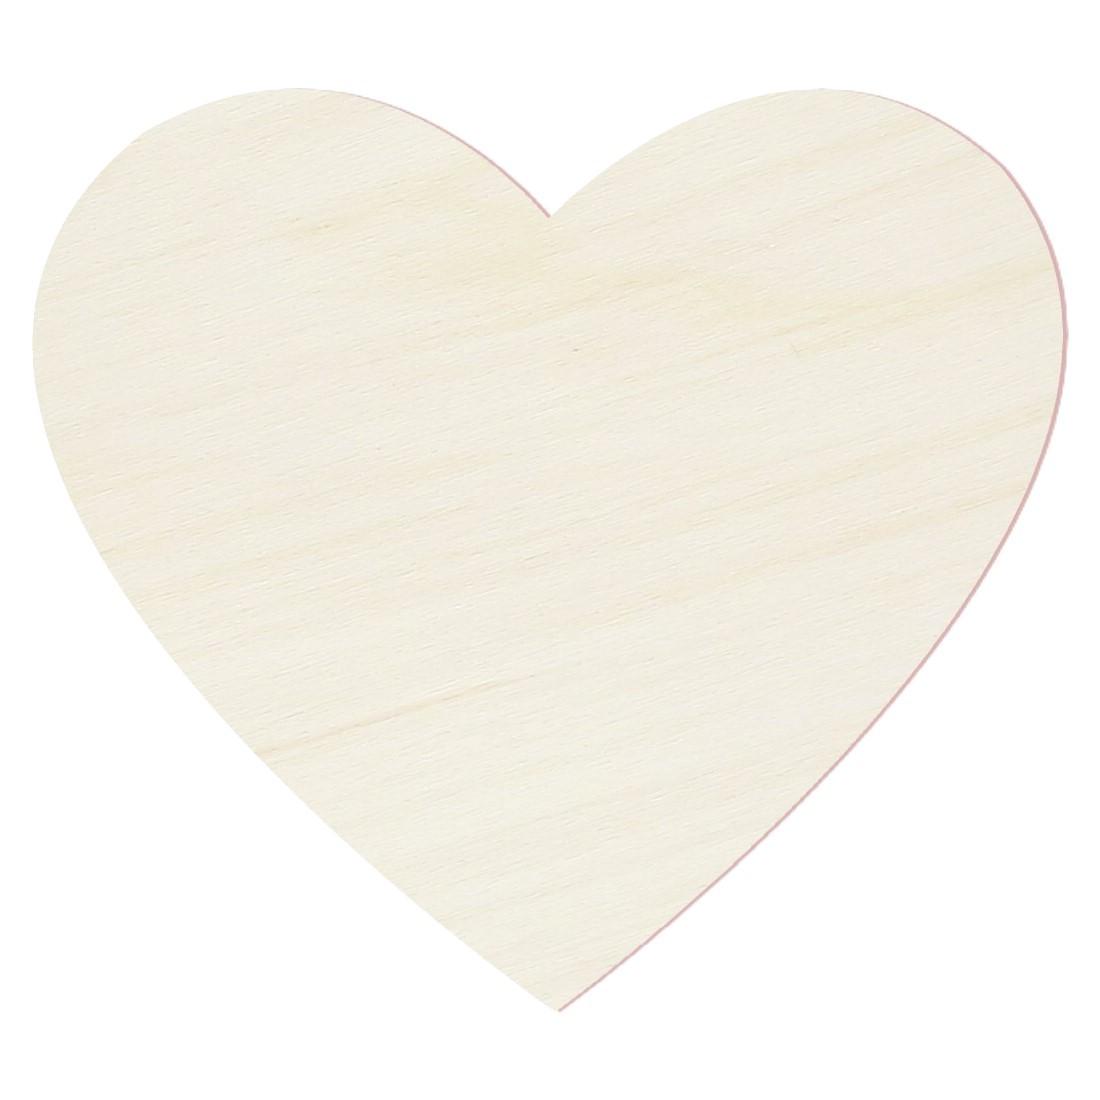 sperrholz herzen holzscheiben zuschnitte 3mm in vielen verschiedenen gr en ebay. Black Bedroom Furniture Sets. Home Design Ideas